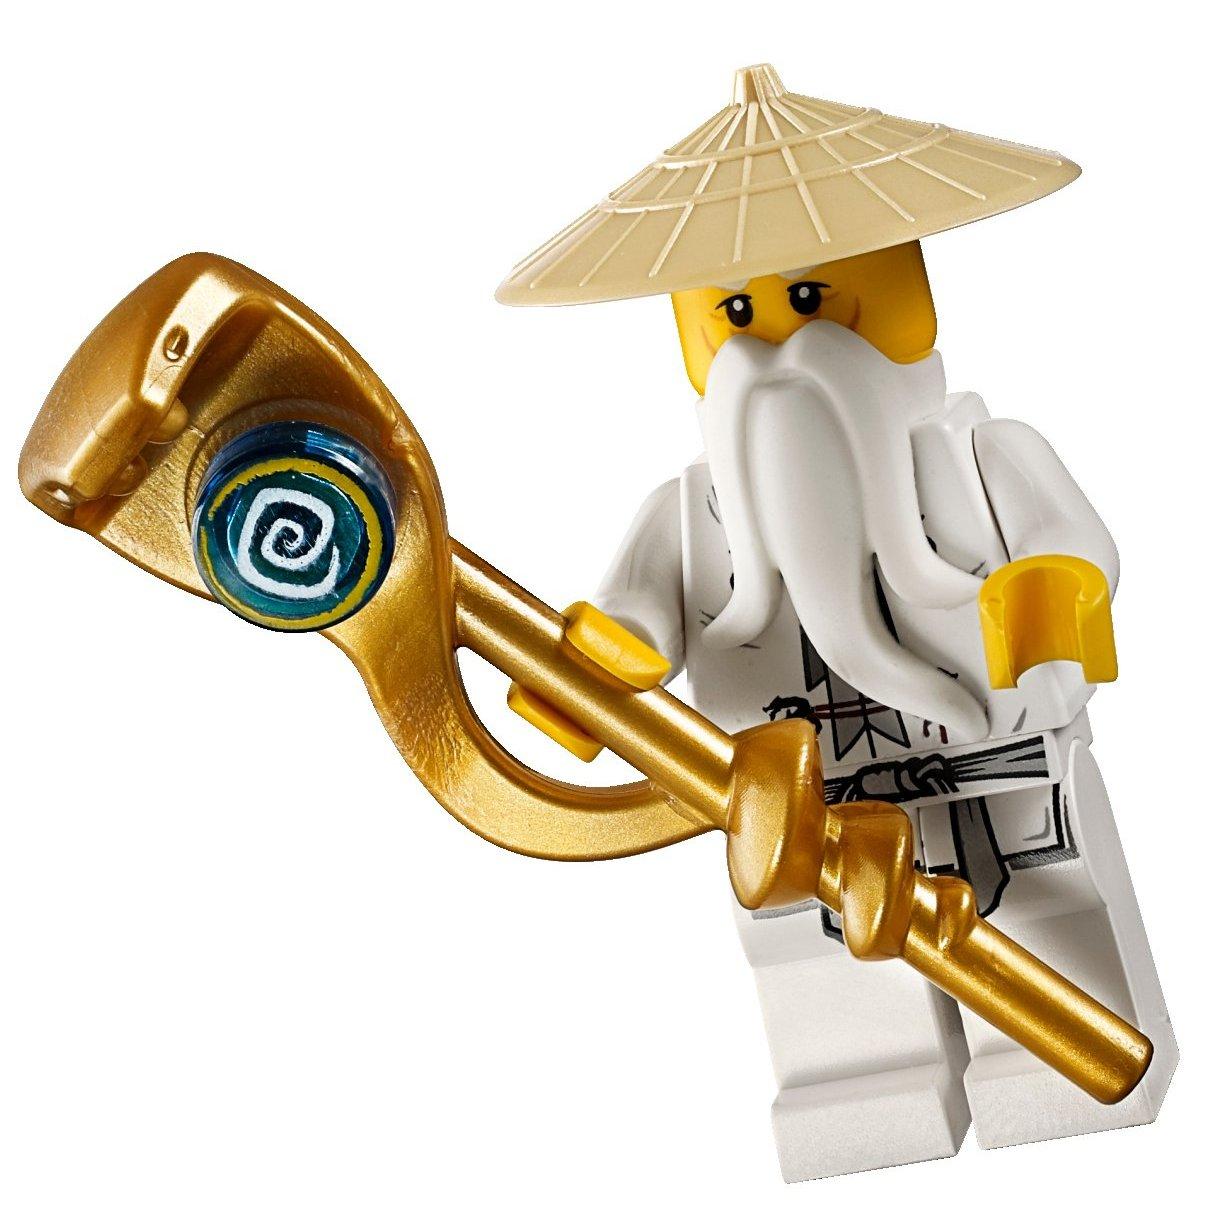 Sensei wu lego minifigures wiki fandom powered by wikia - Sensei ninjago ...